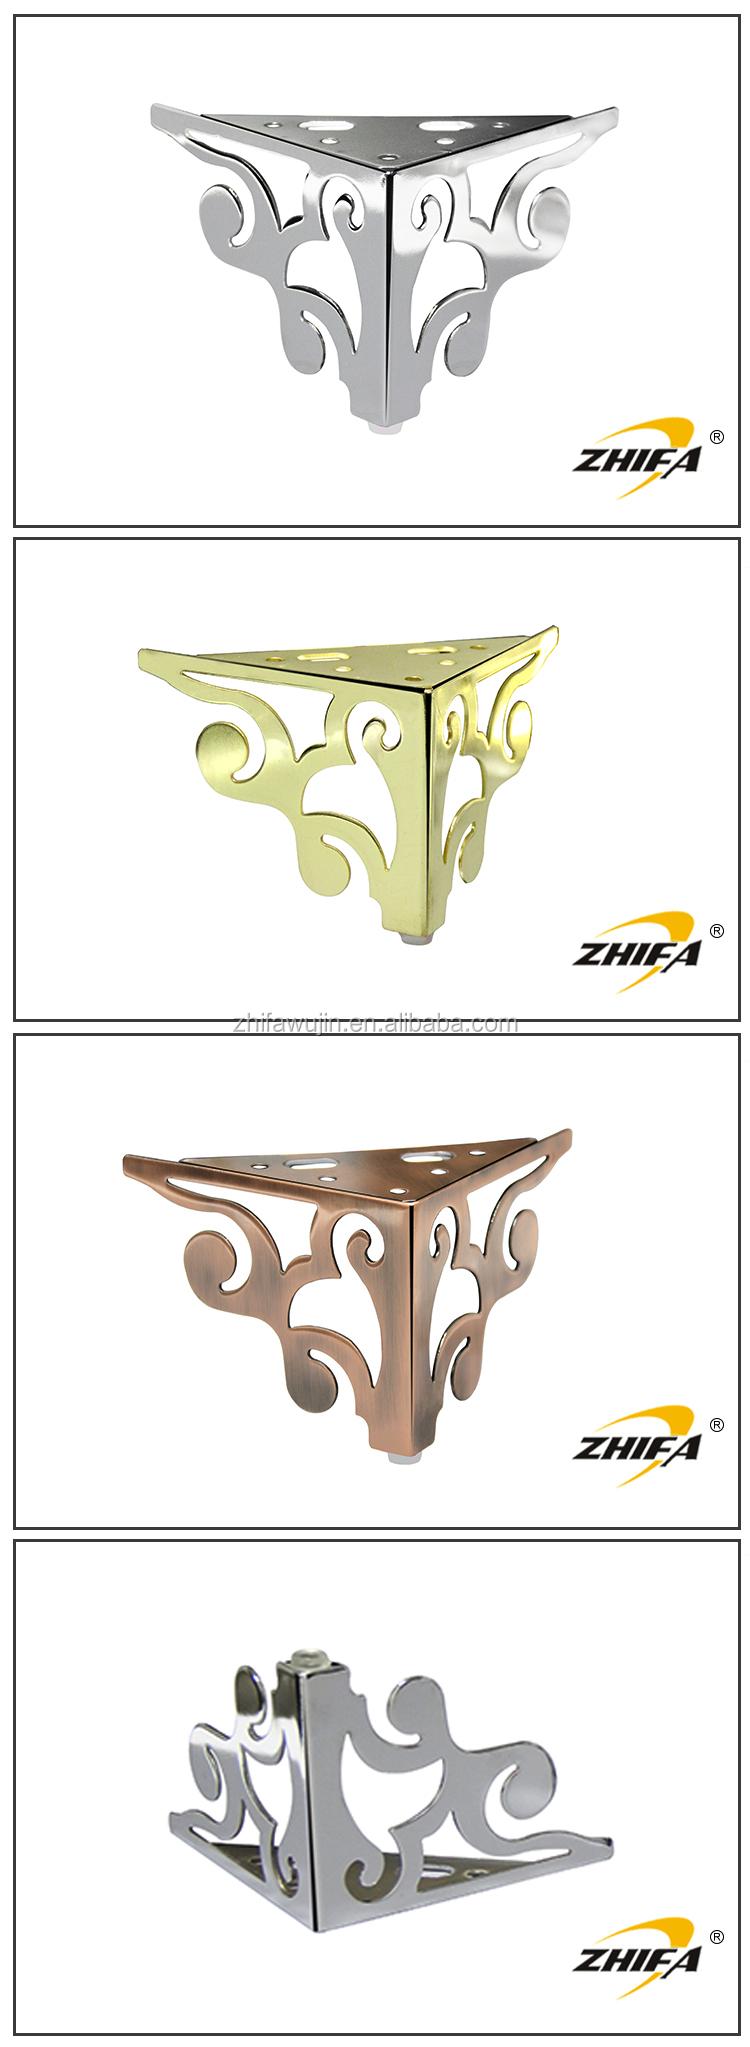 Furniture Legs Short zhifa zf-a109 new design furniture leg extensions,sofa bun feet